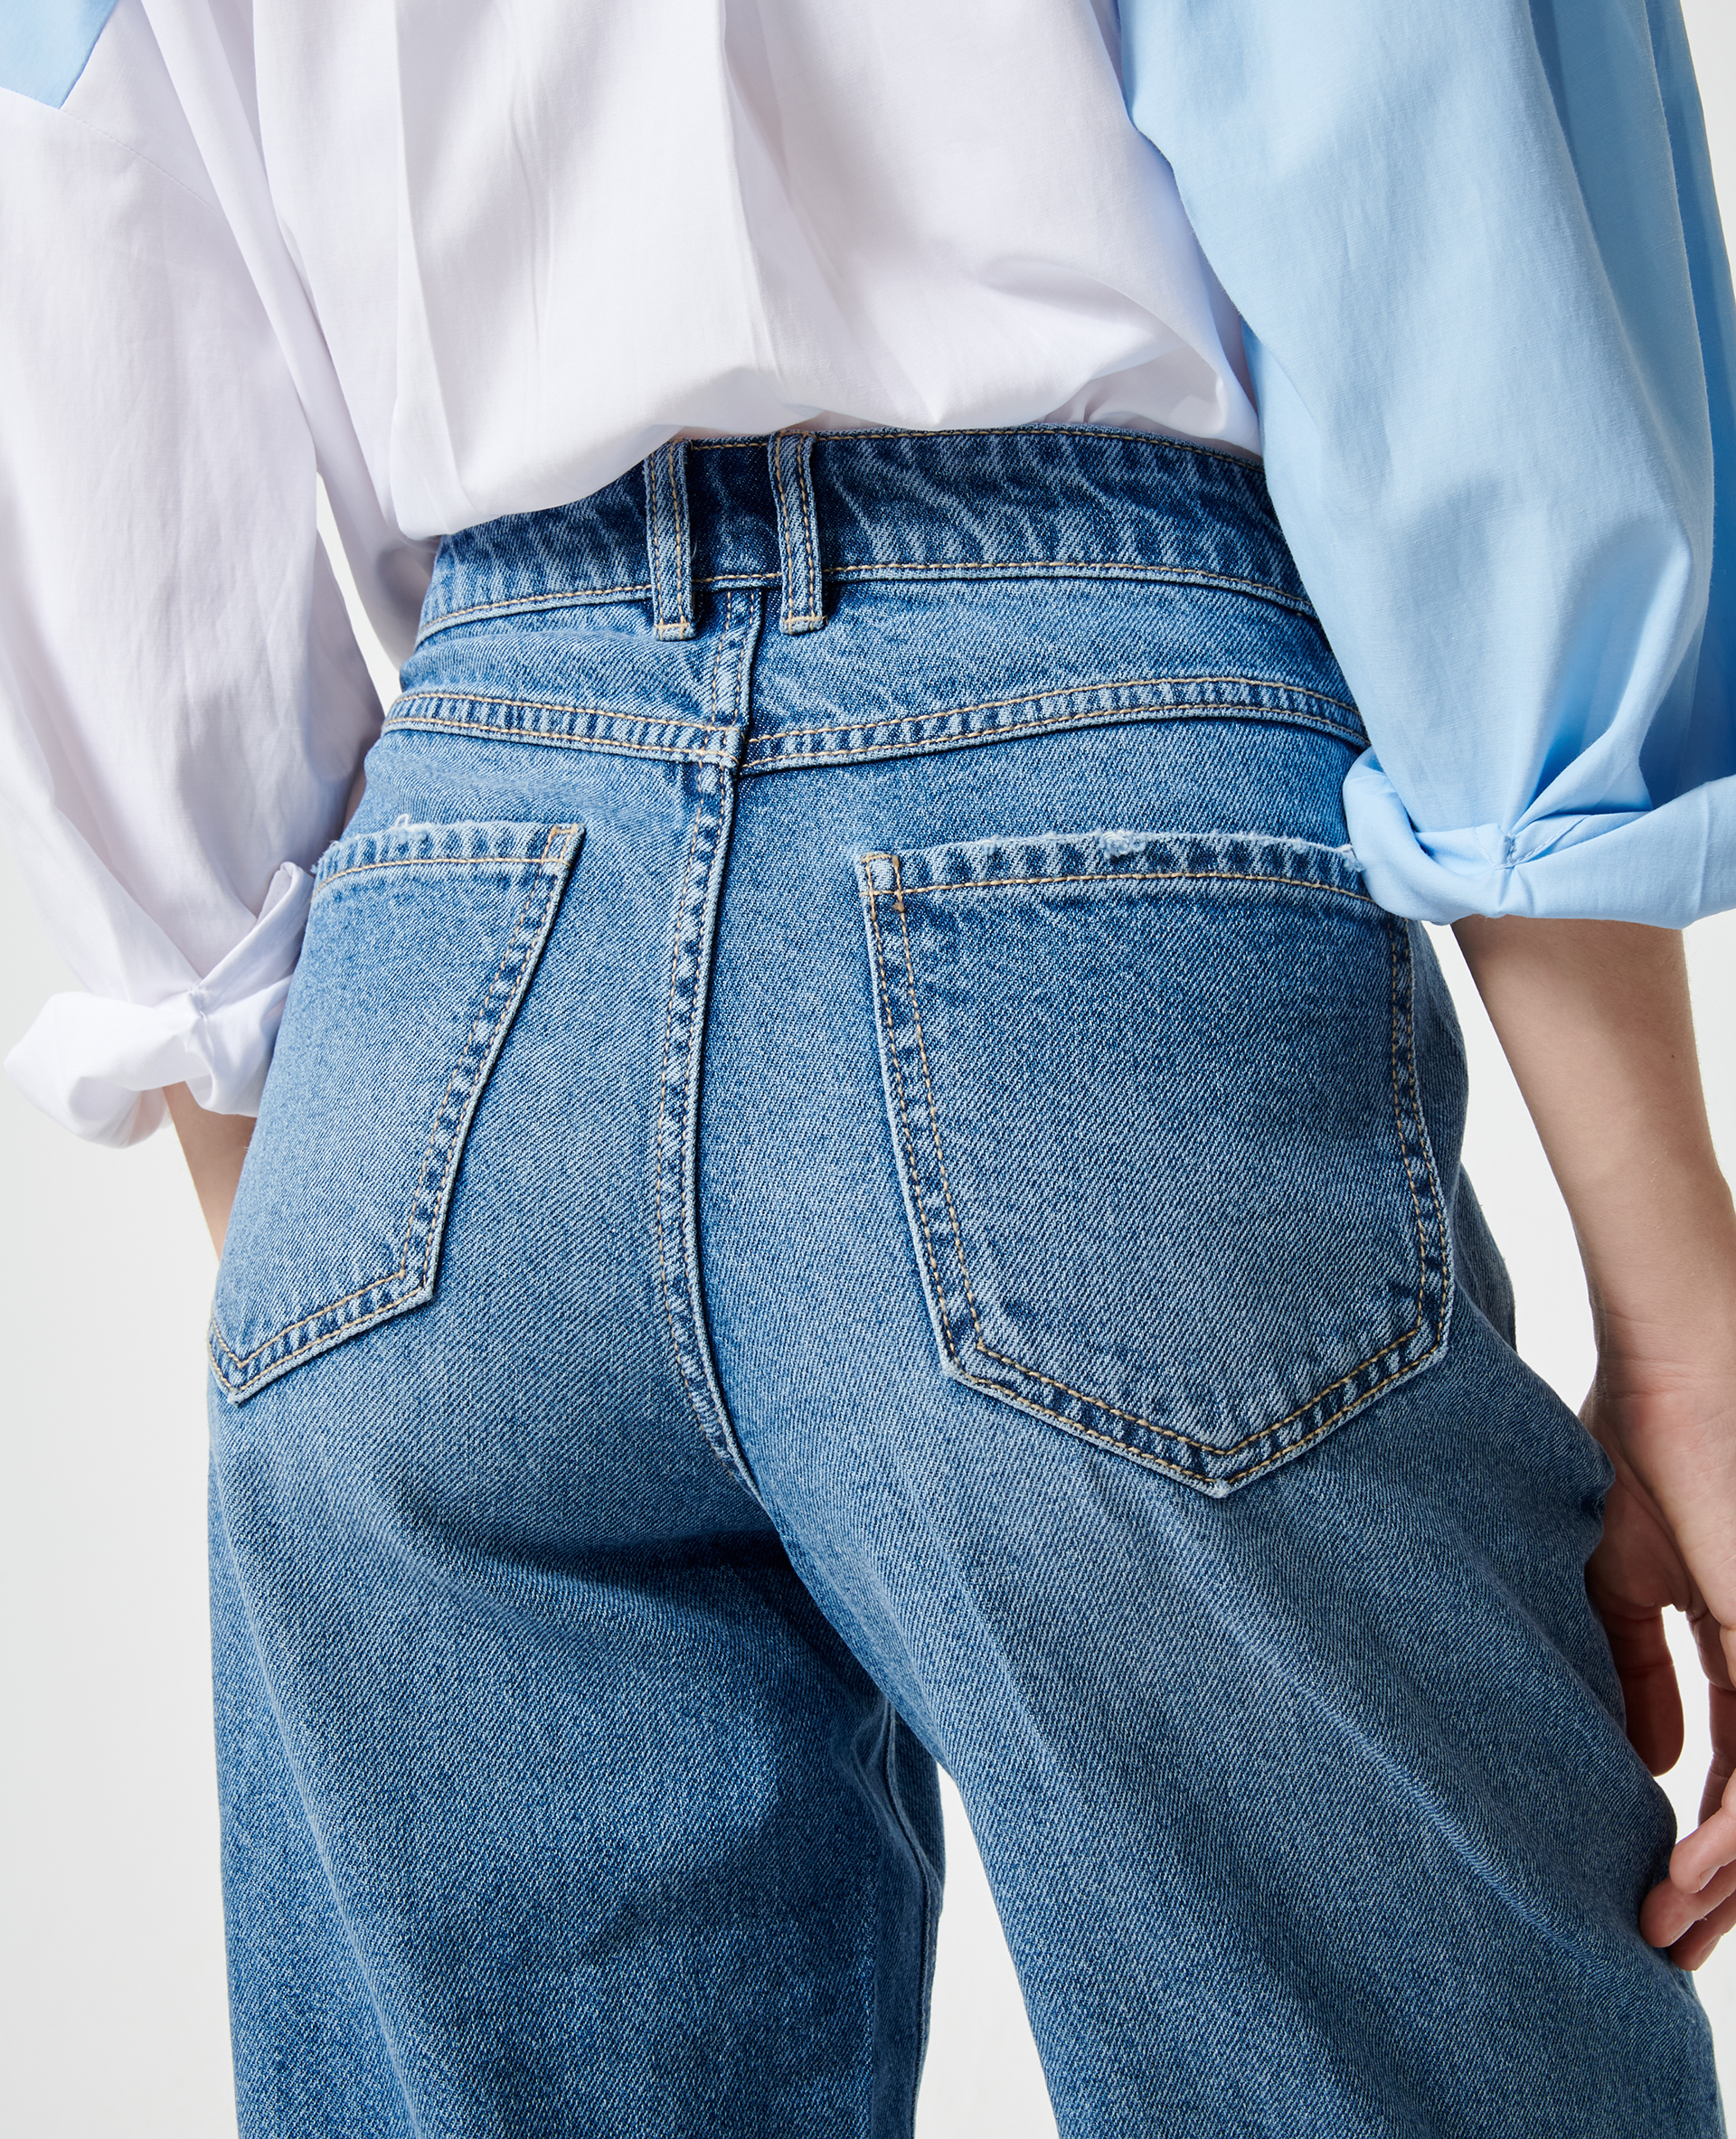 Brede jeans denimblauw - Pimkie